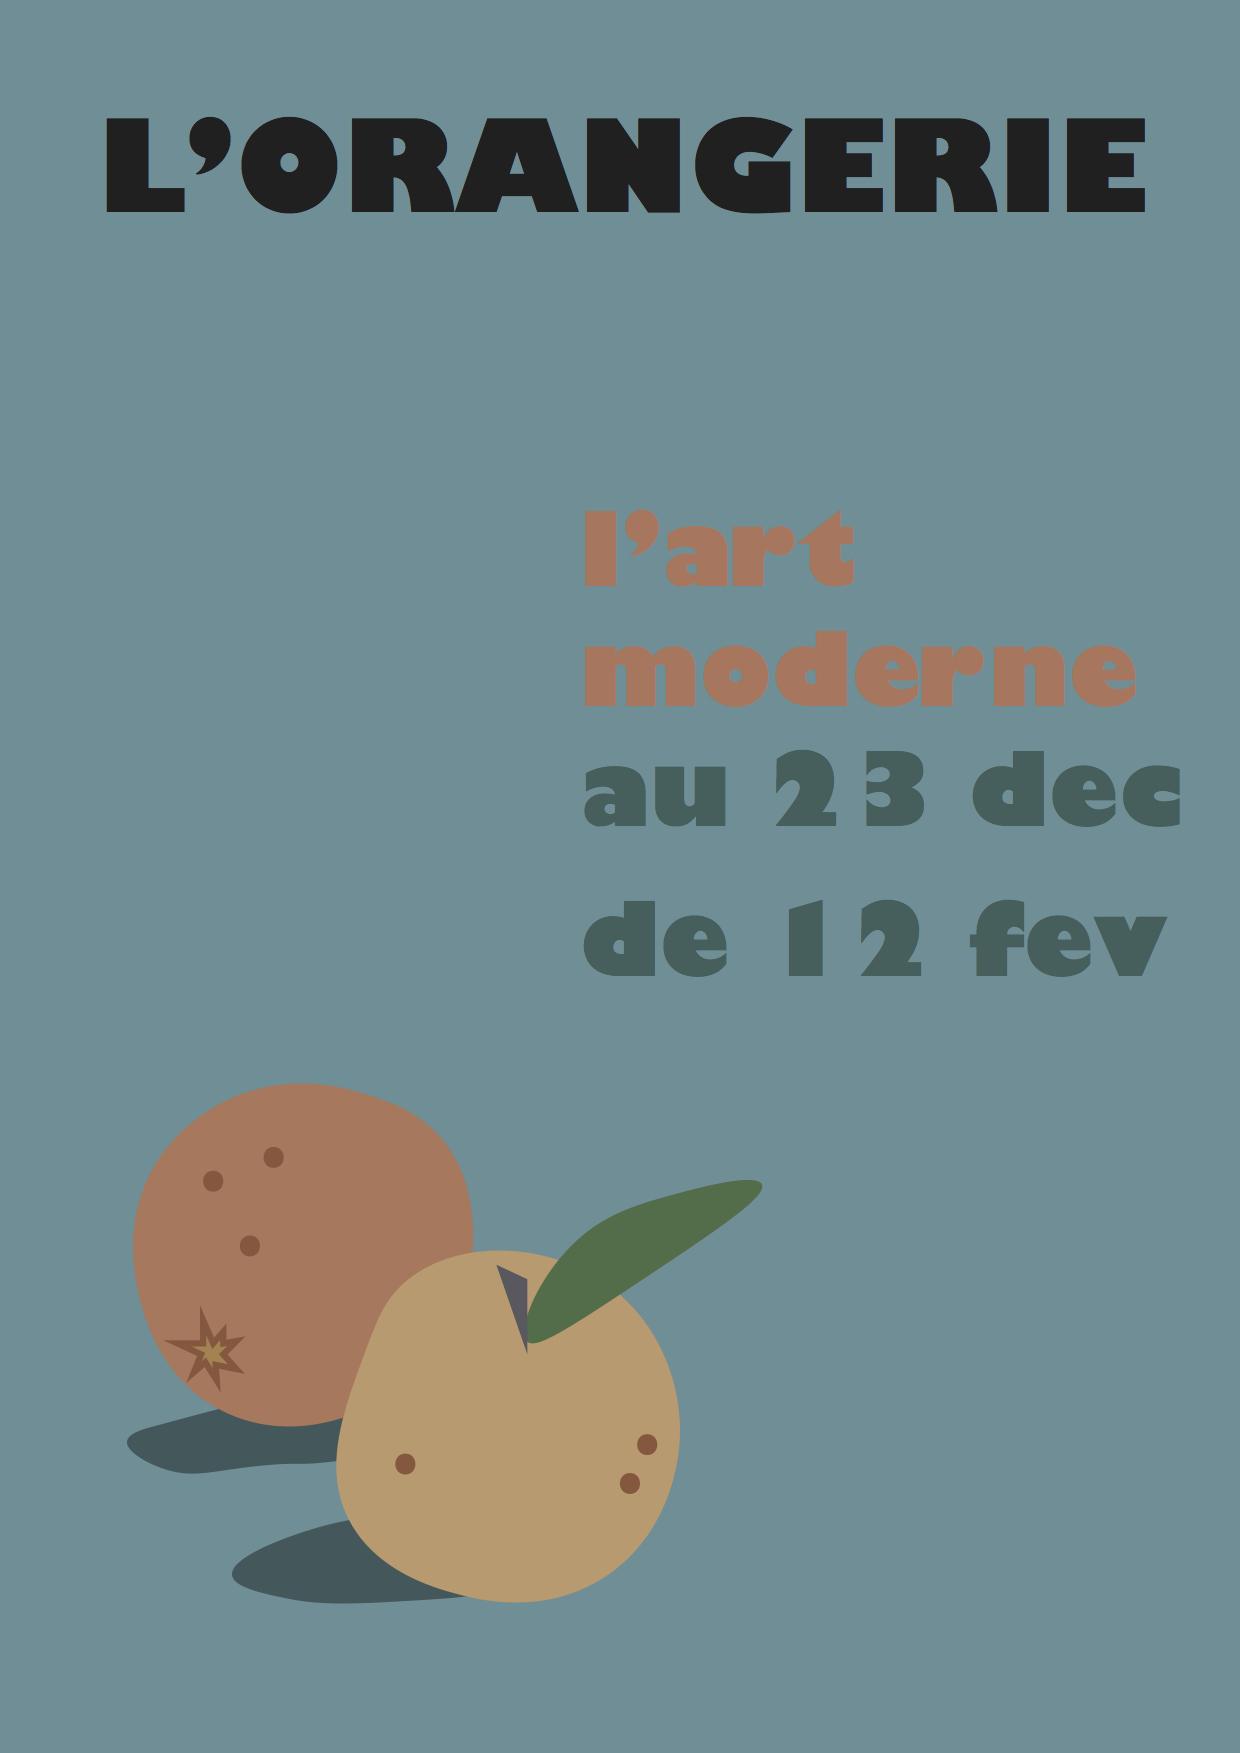 Mock installation flyer for L'Orangerie